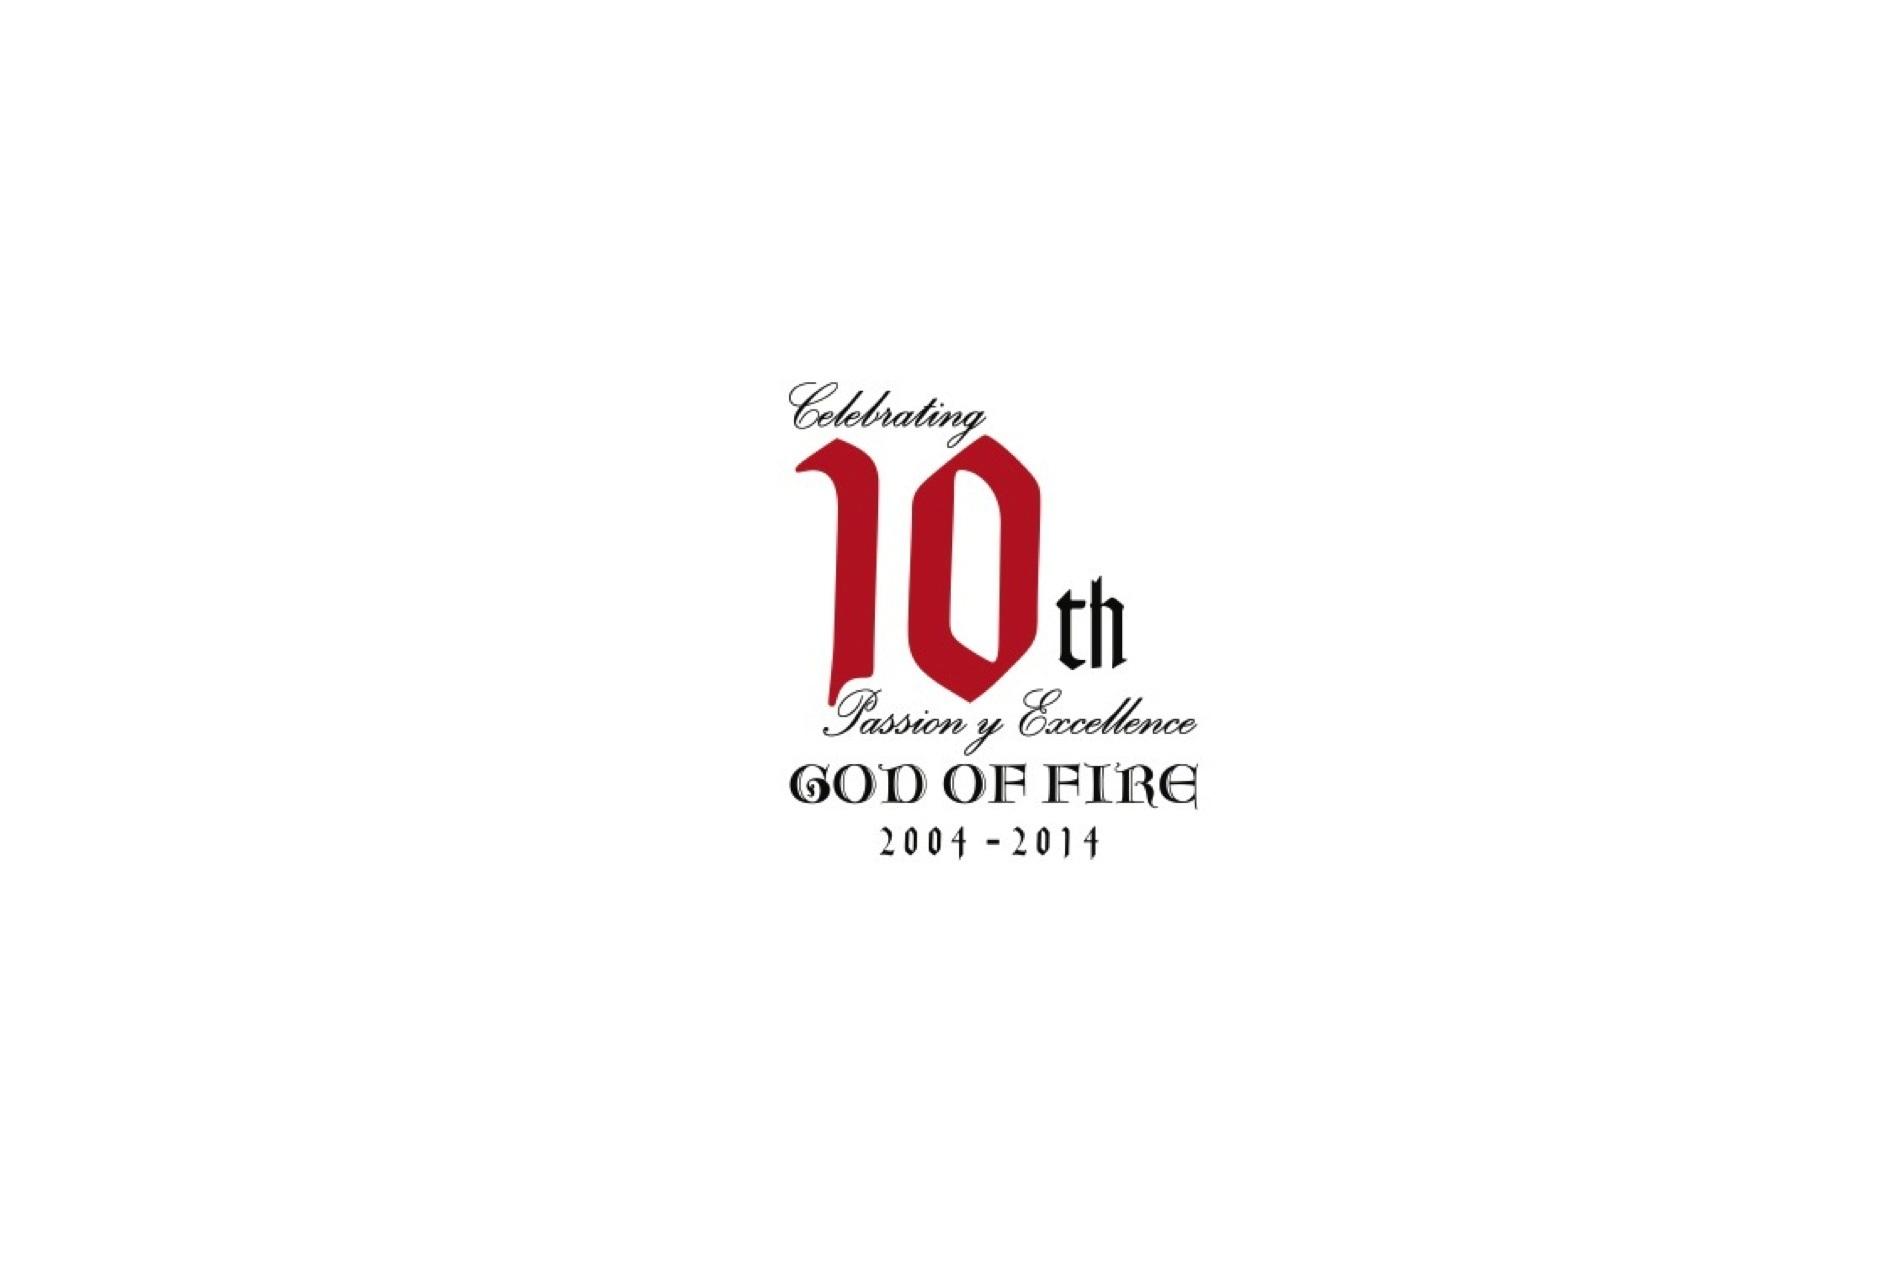 God of Fire 10th Anniversary Logo